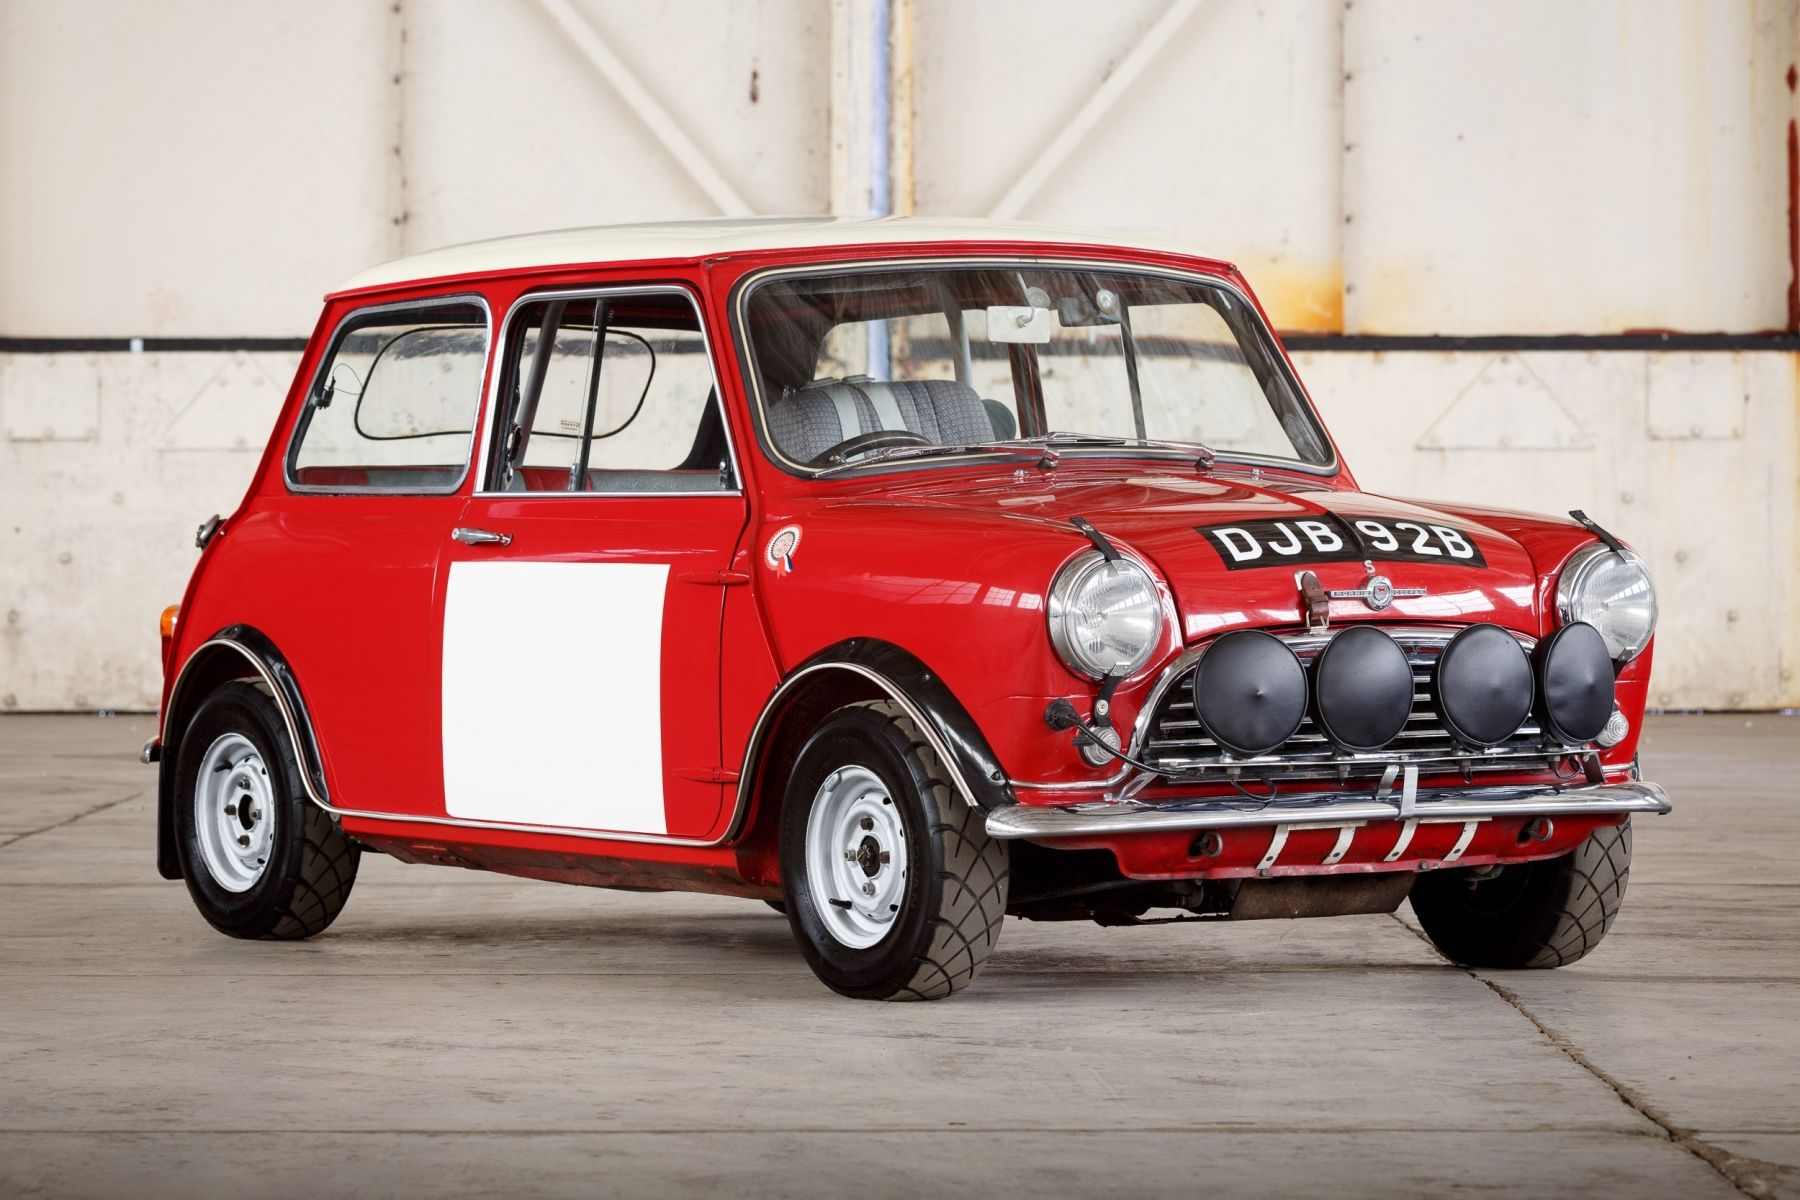 1964 Morris Mini Cooper S Bmc Works Compeion Clic Driver Market